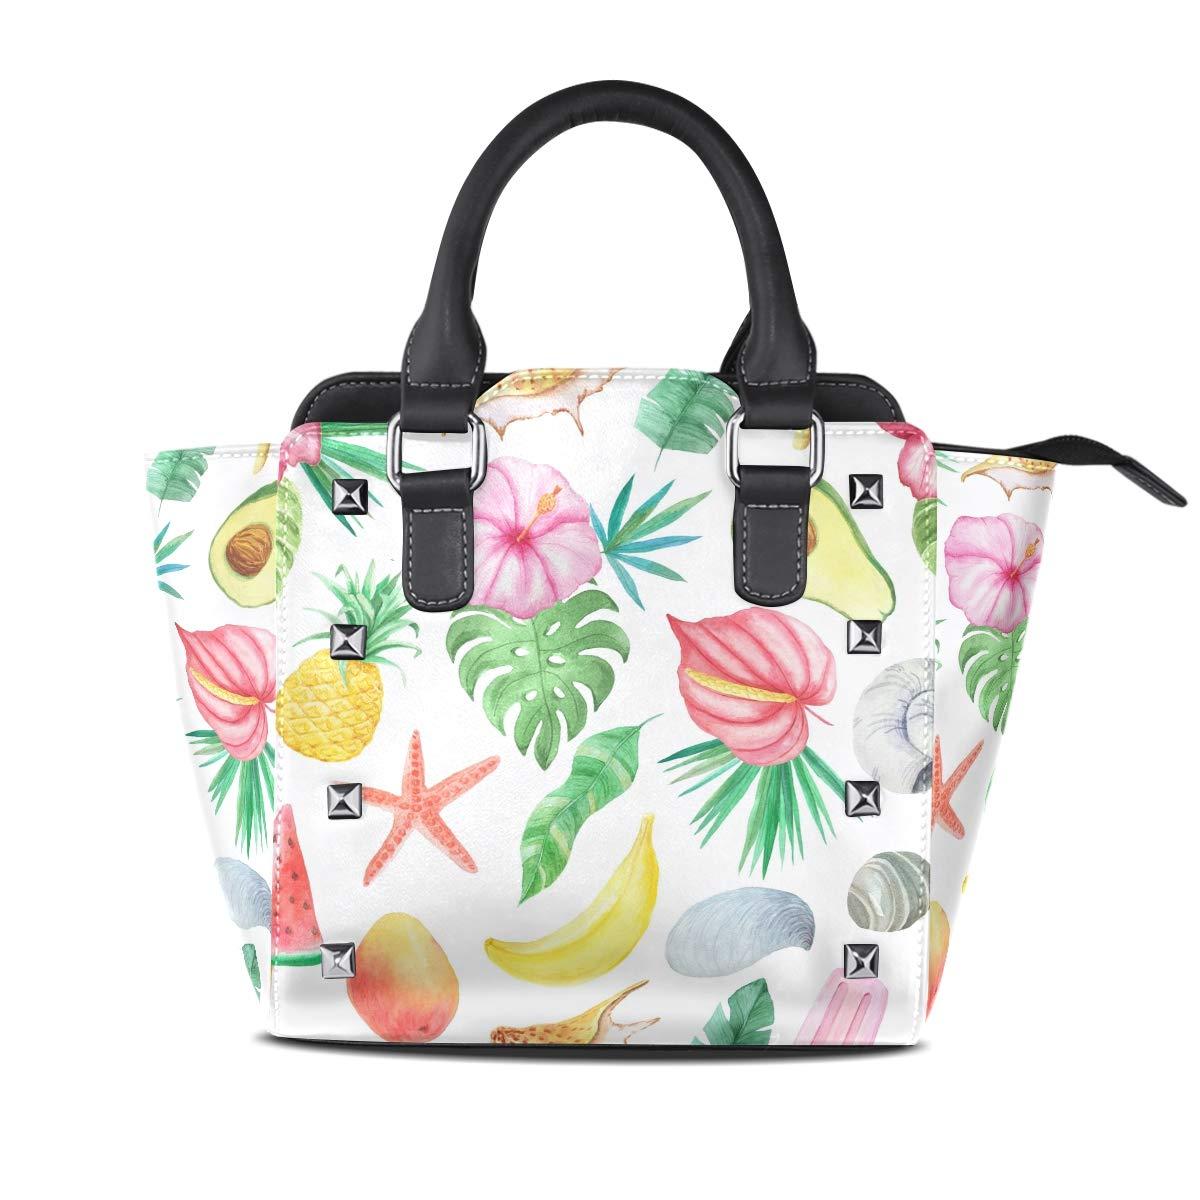 Design 2 Cat Girl Top Handle Satchel Handbags Leather Tote Adjustable Shoulder Rivet Bag for Women